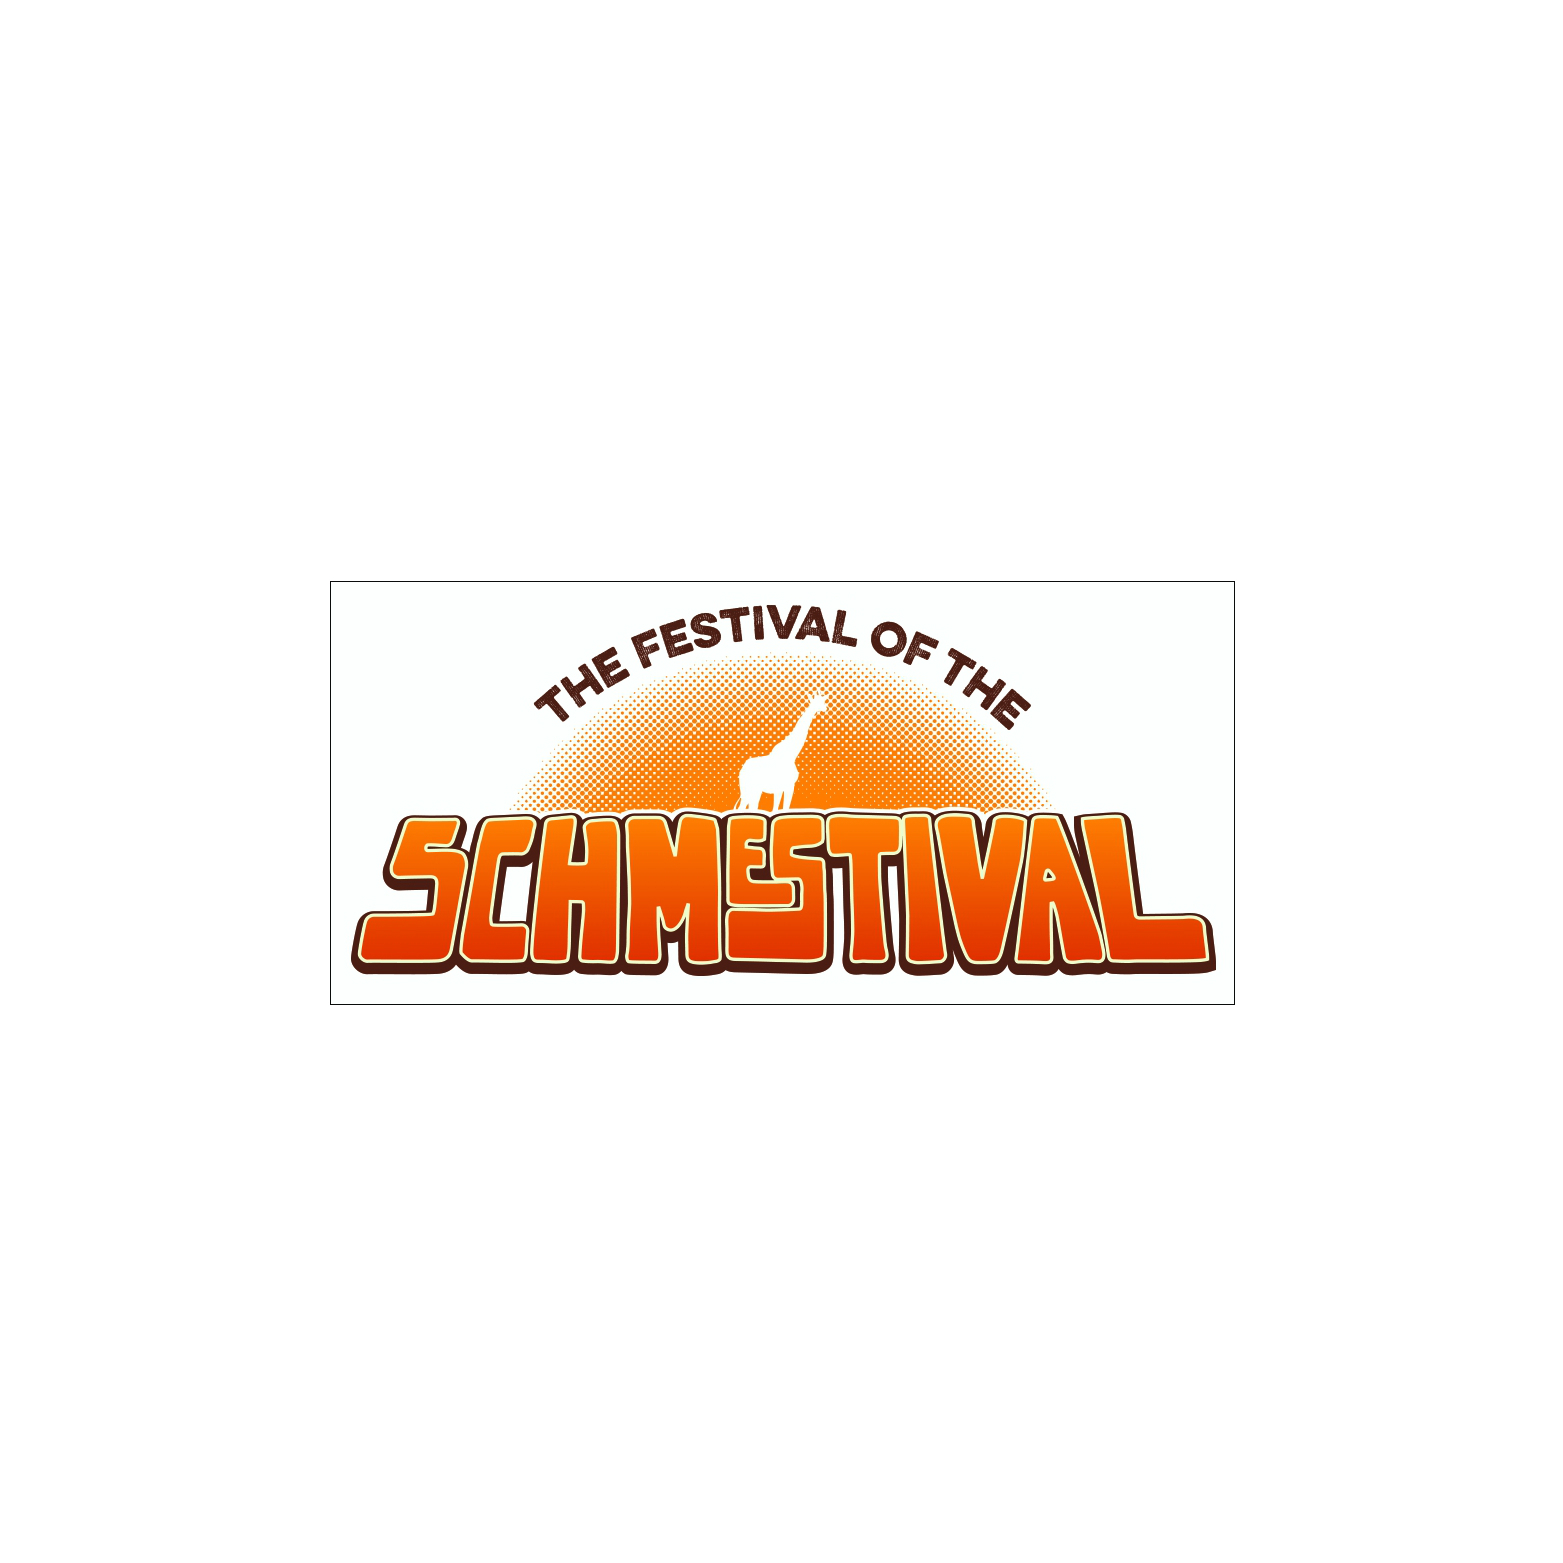 Schmestival Logo Bumper Sticker